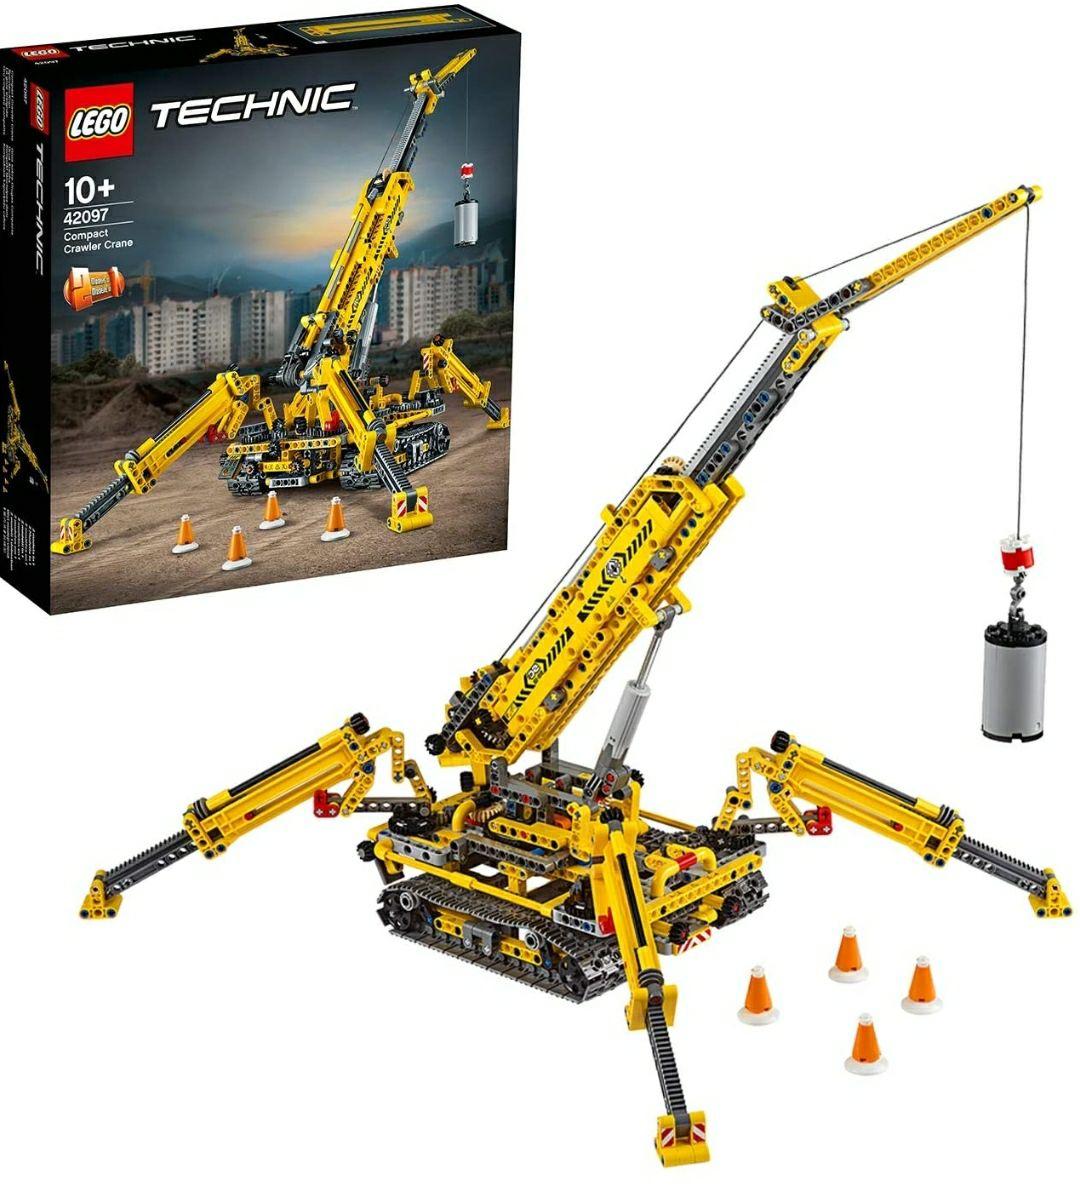 LEGO 42097 Technic Crawler Crane Grúa de Torre compacta, Juego de construcción 2 en 1